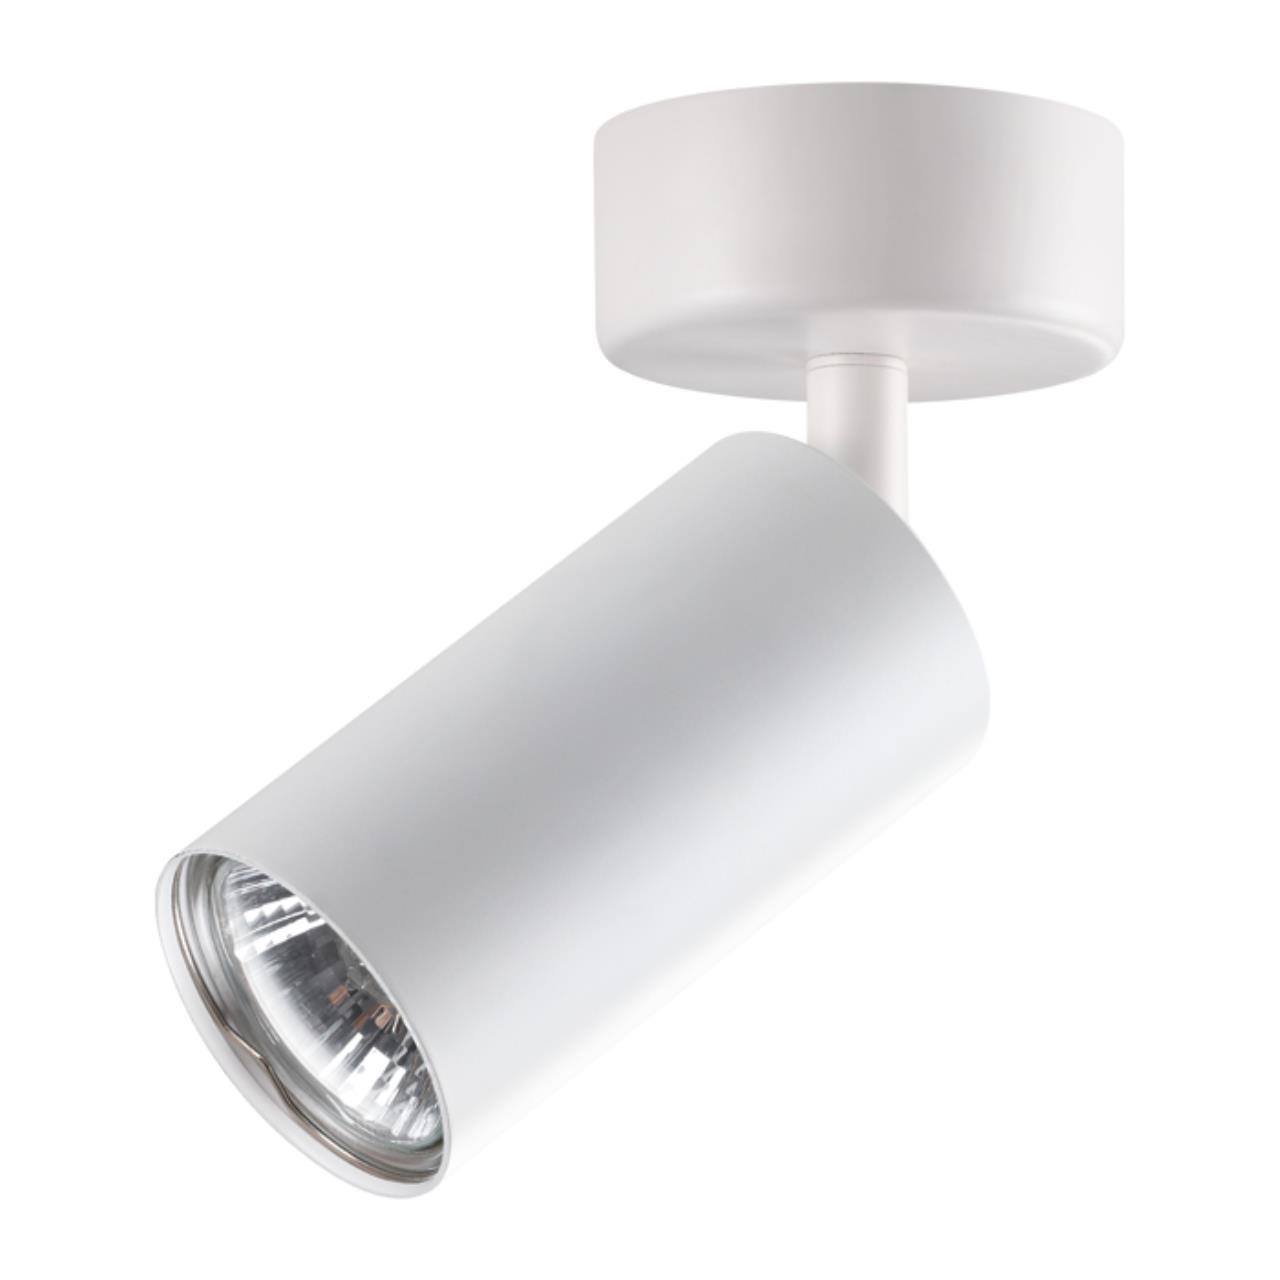 370394 OVER NT18 101 белый Накладной светильник IP20 GU10 50W 220V PIPE